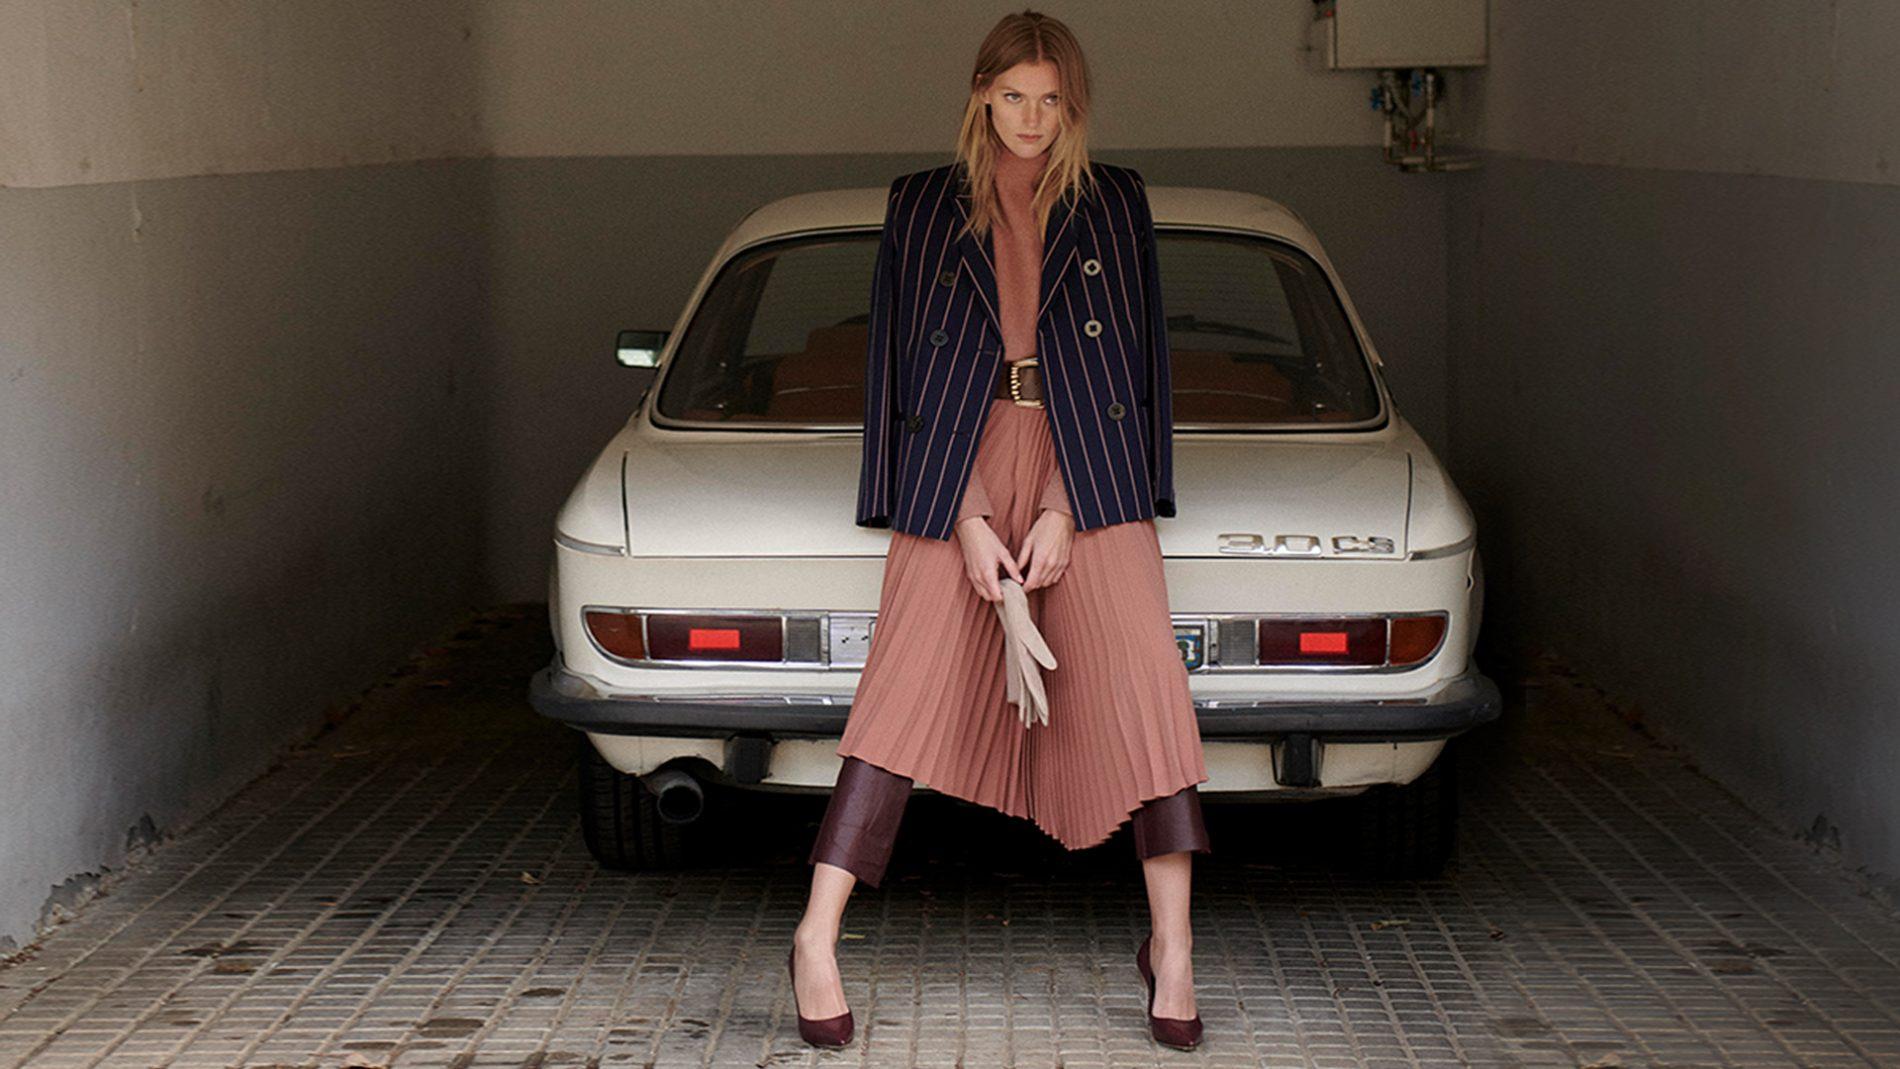 El Corte Inglés Ready-To-Wear Designer Shoes Victoria Beckham Helmut Lang Etro Casadei